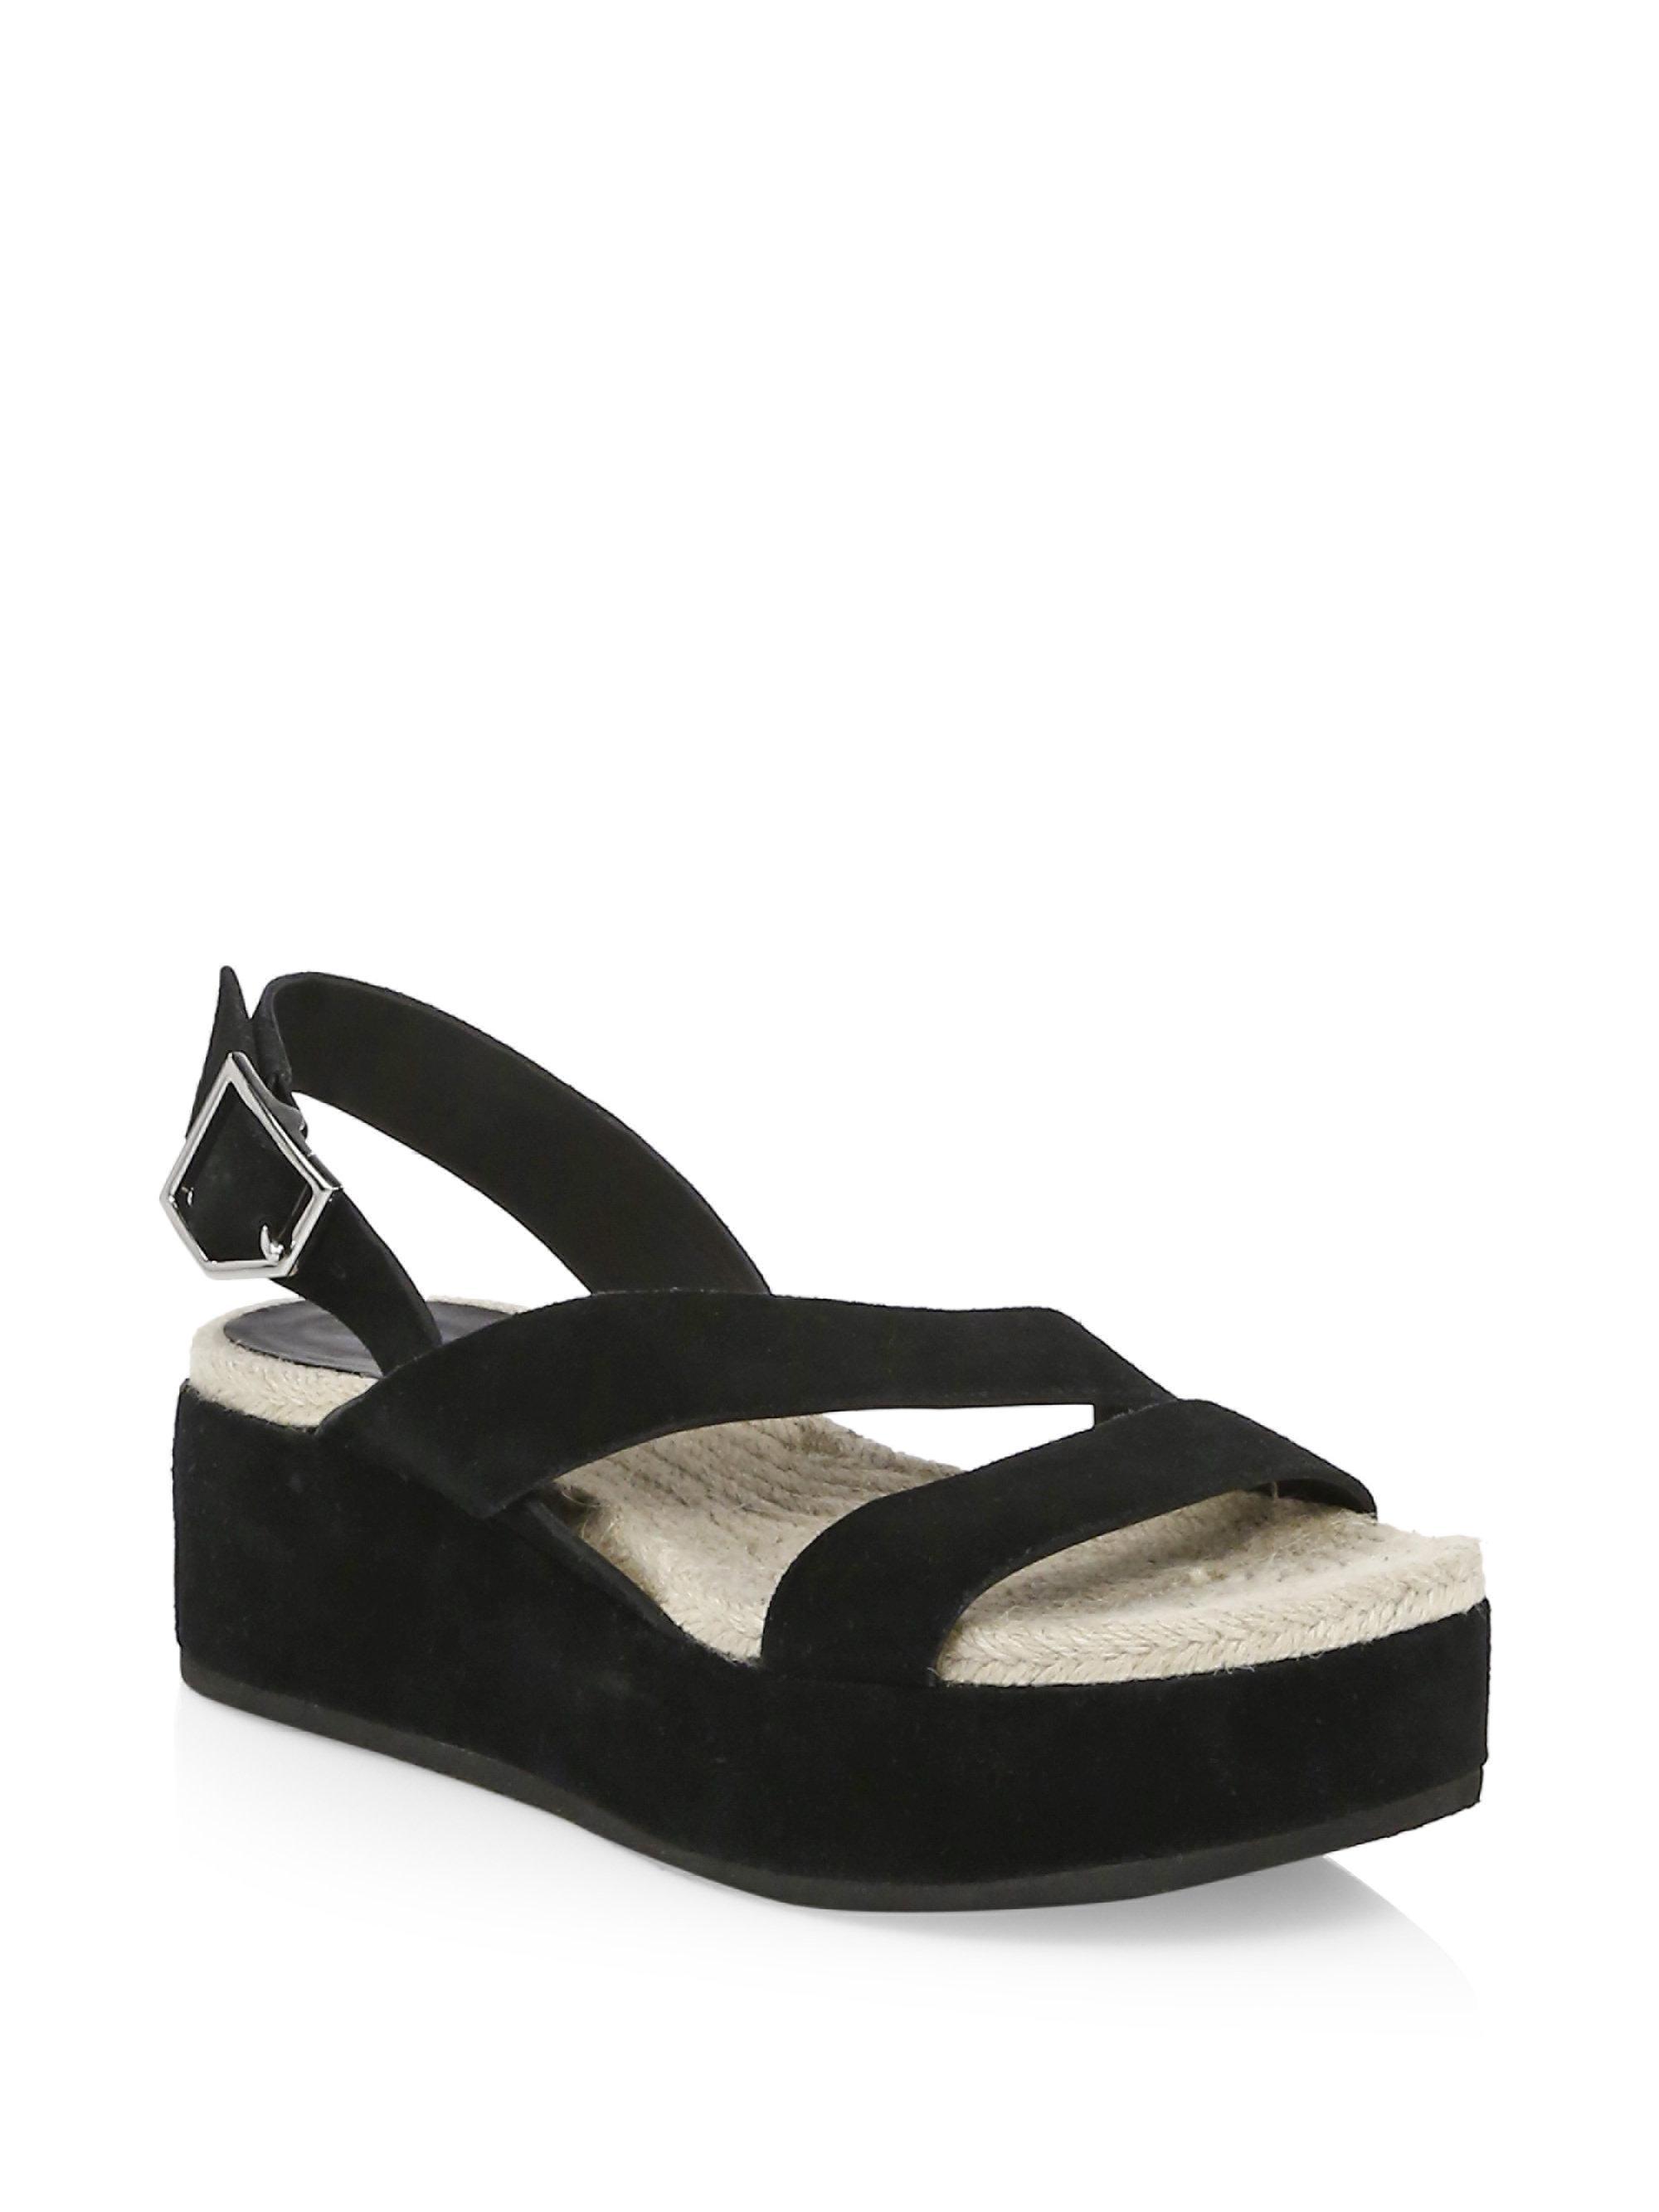 9a0d3f162e3 Rag   Bone Megan Suede Wedge Sandals in Black - Lyst